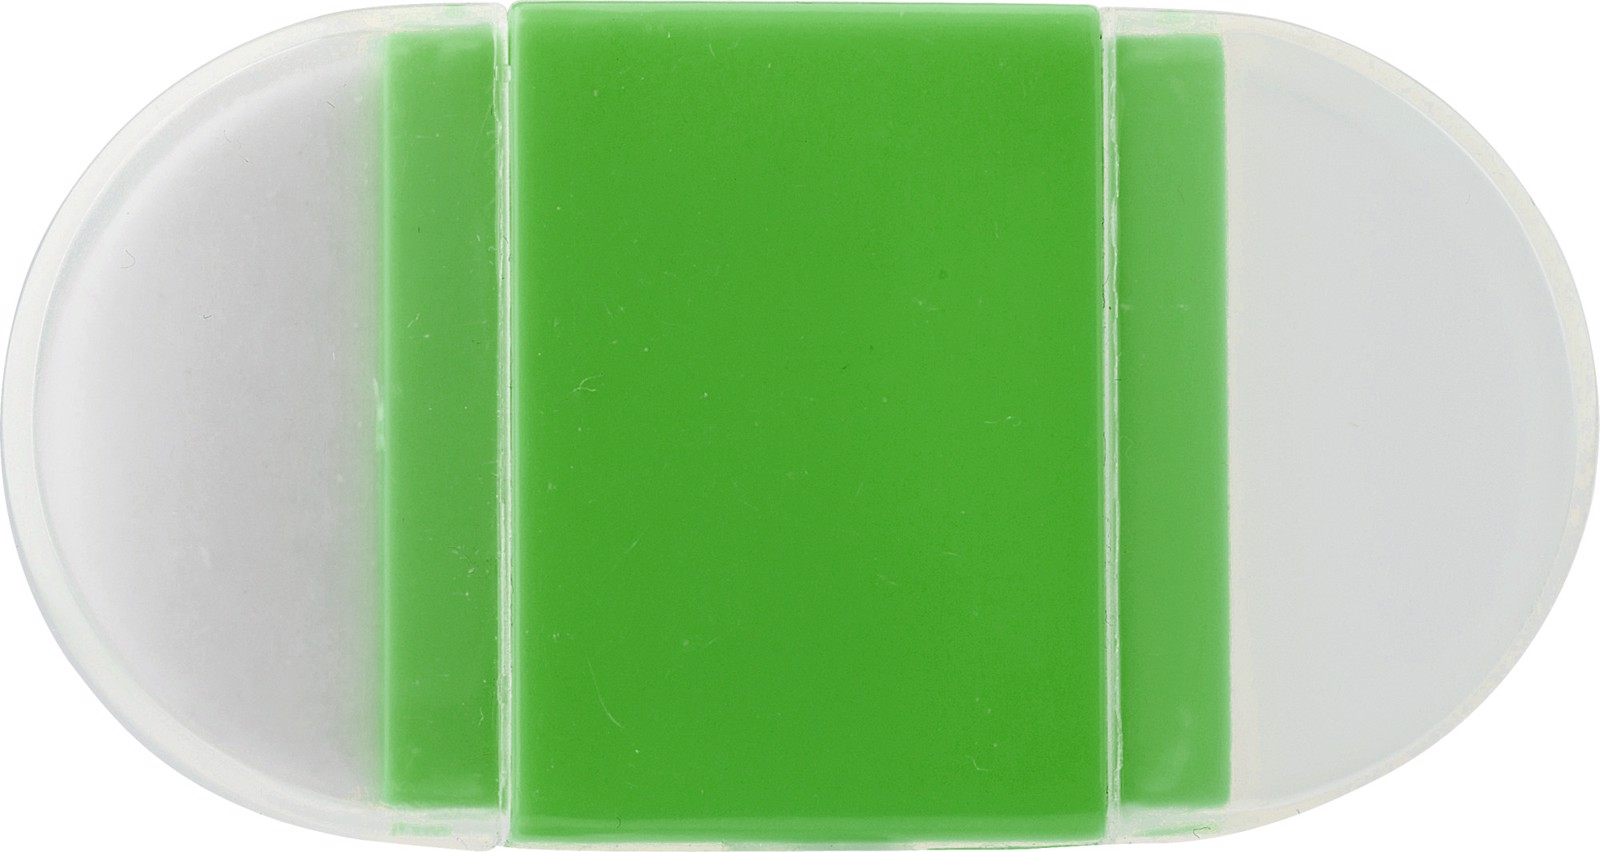 PS pencil sharpener and eraser - Light Green